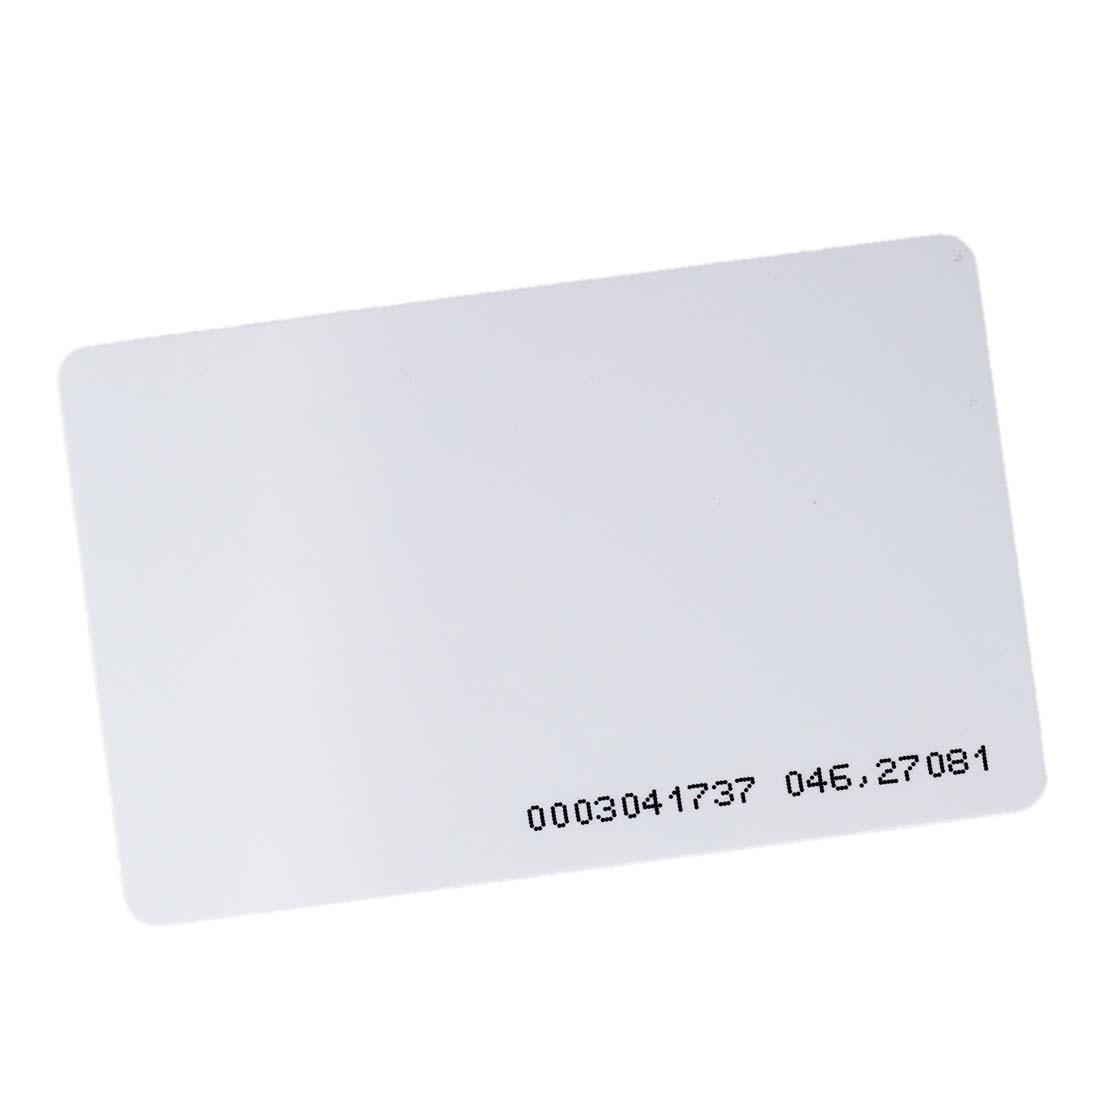 2 Packs 150 Pcs ID Badge Access EM4100 125 KHz RFID